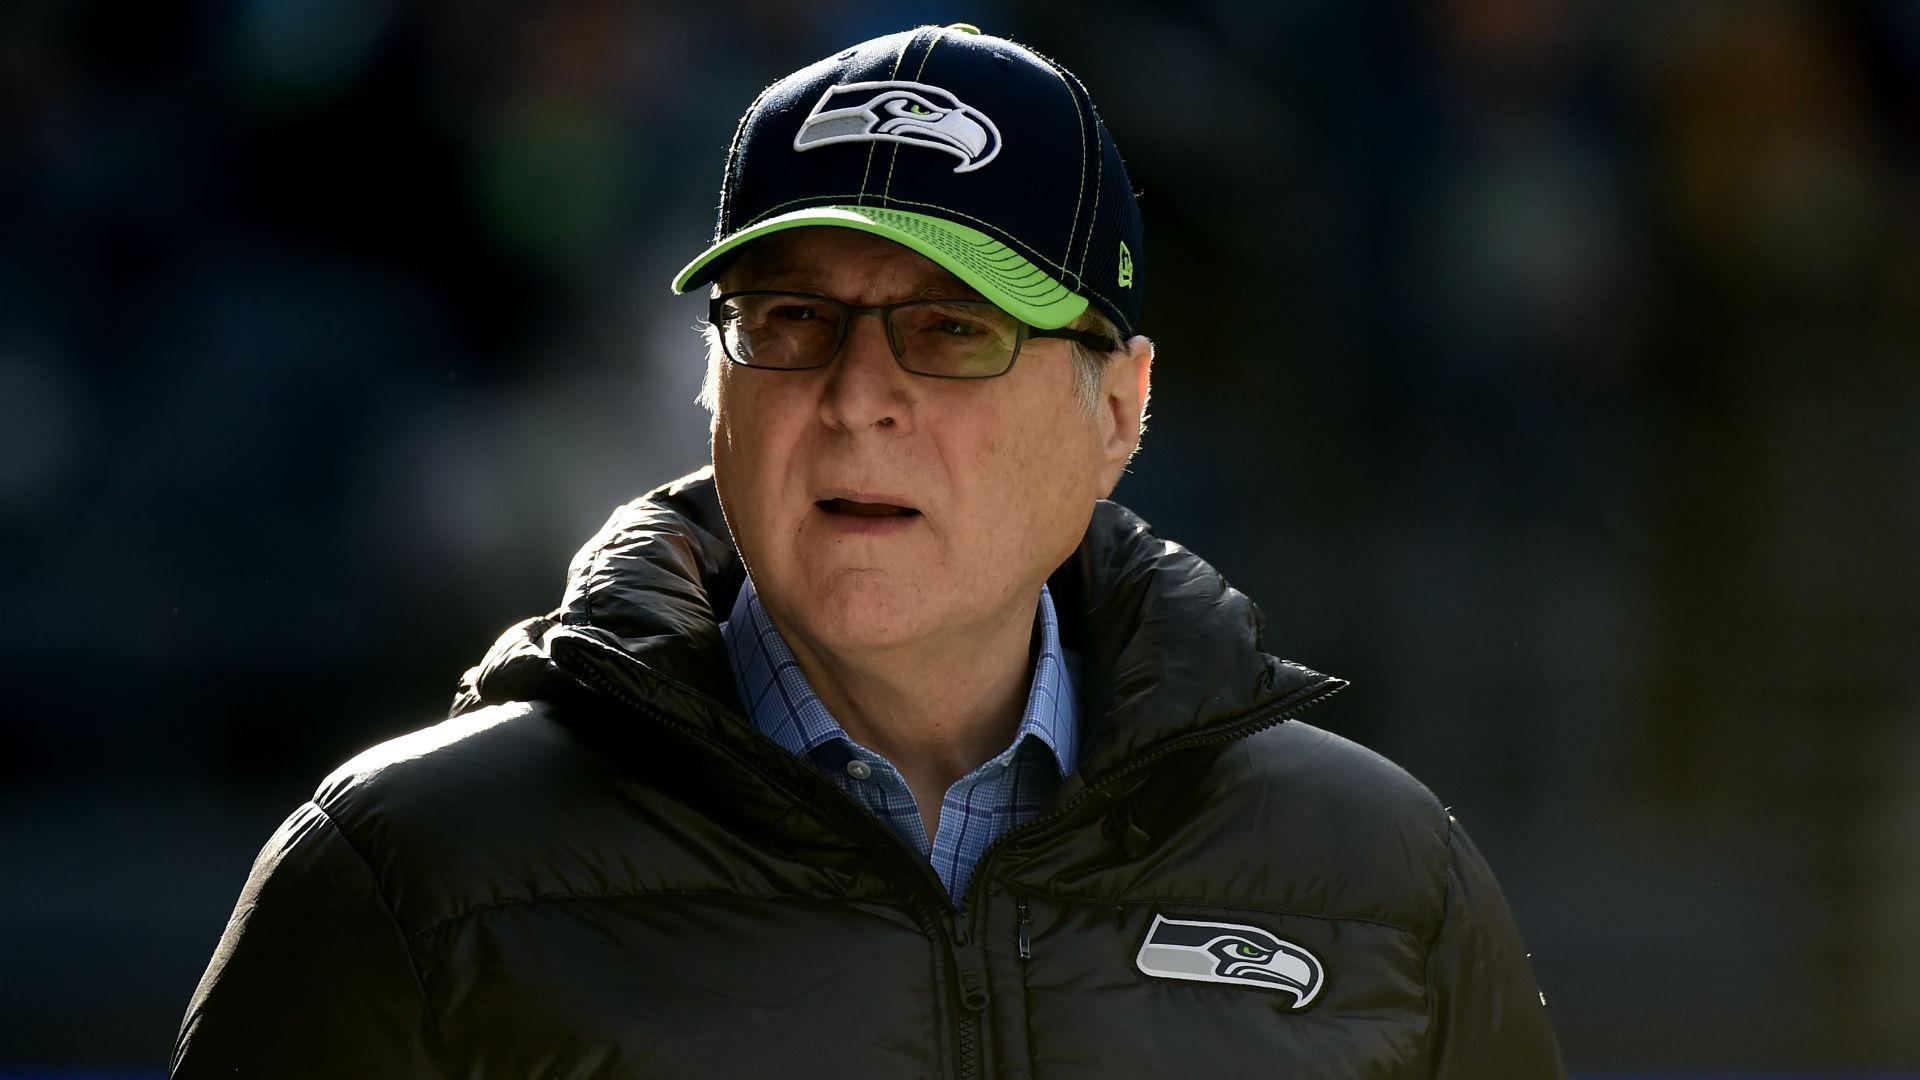 Seahawks won't leave Seattle, NFL owners say following Paul Allen's death